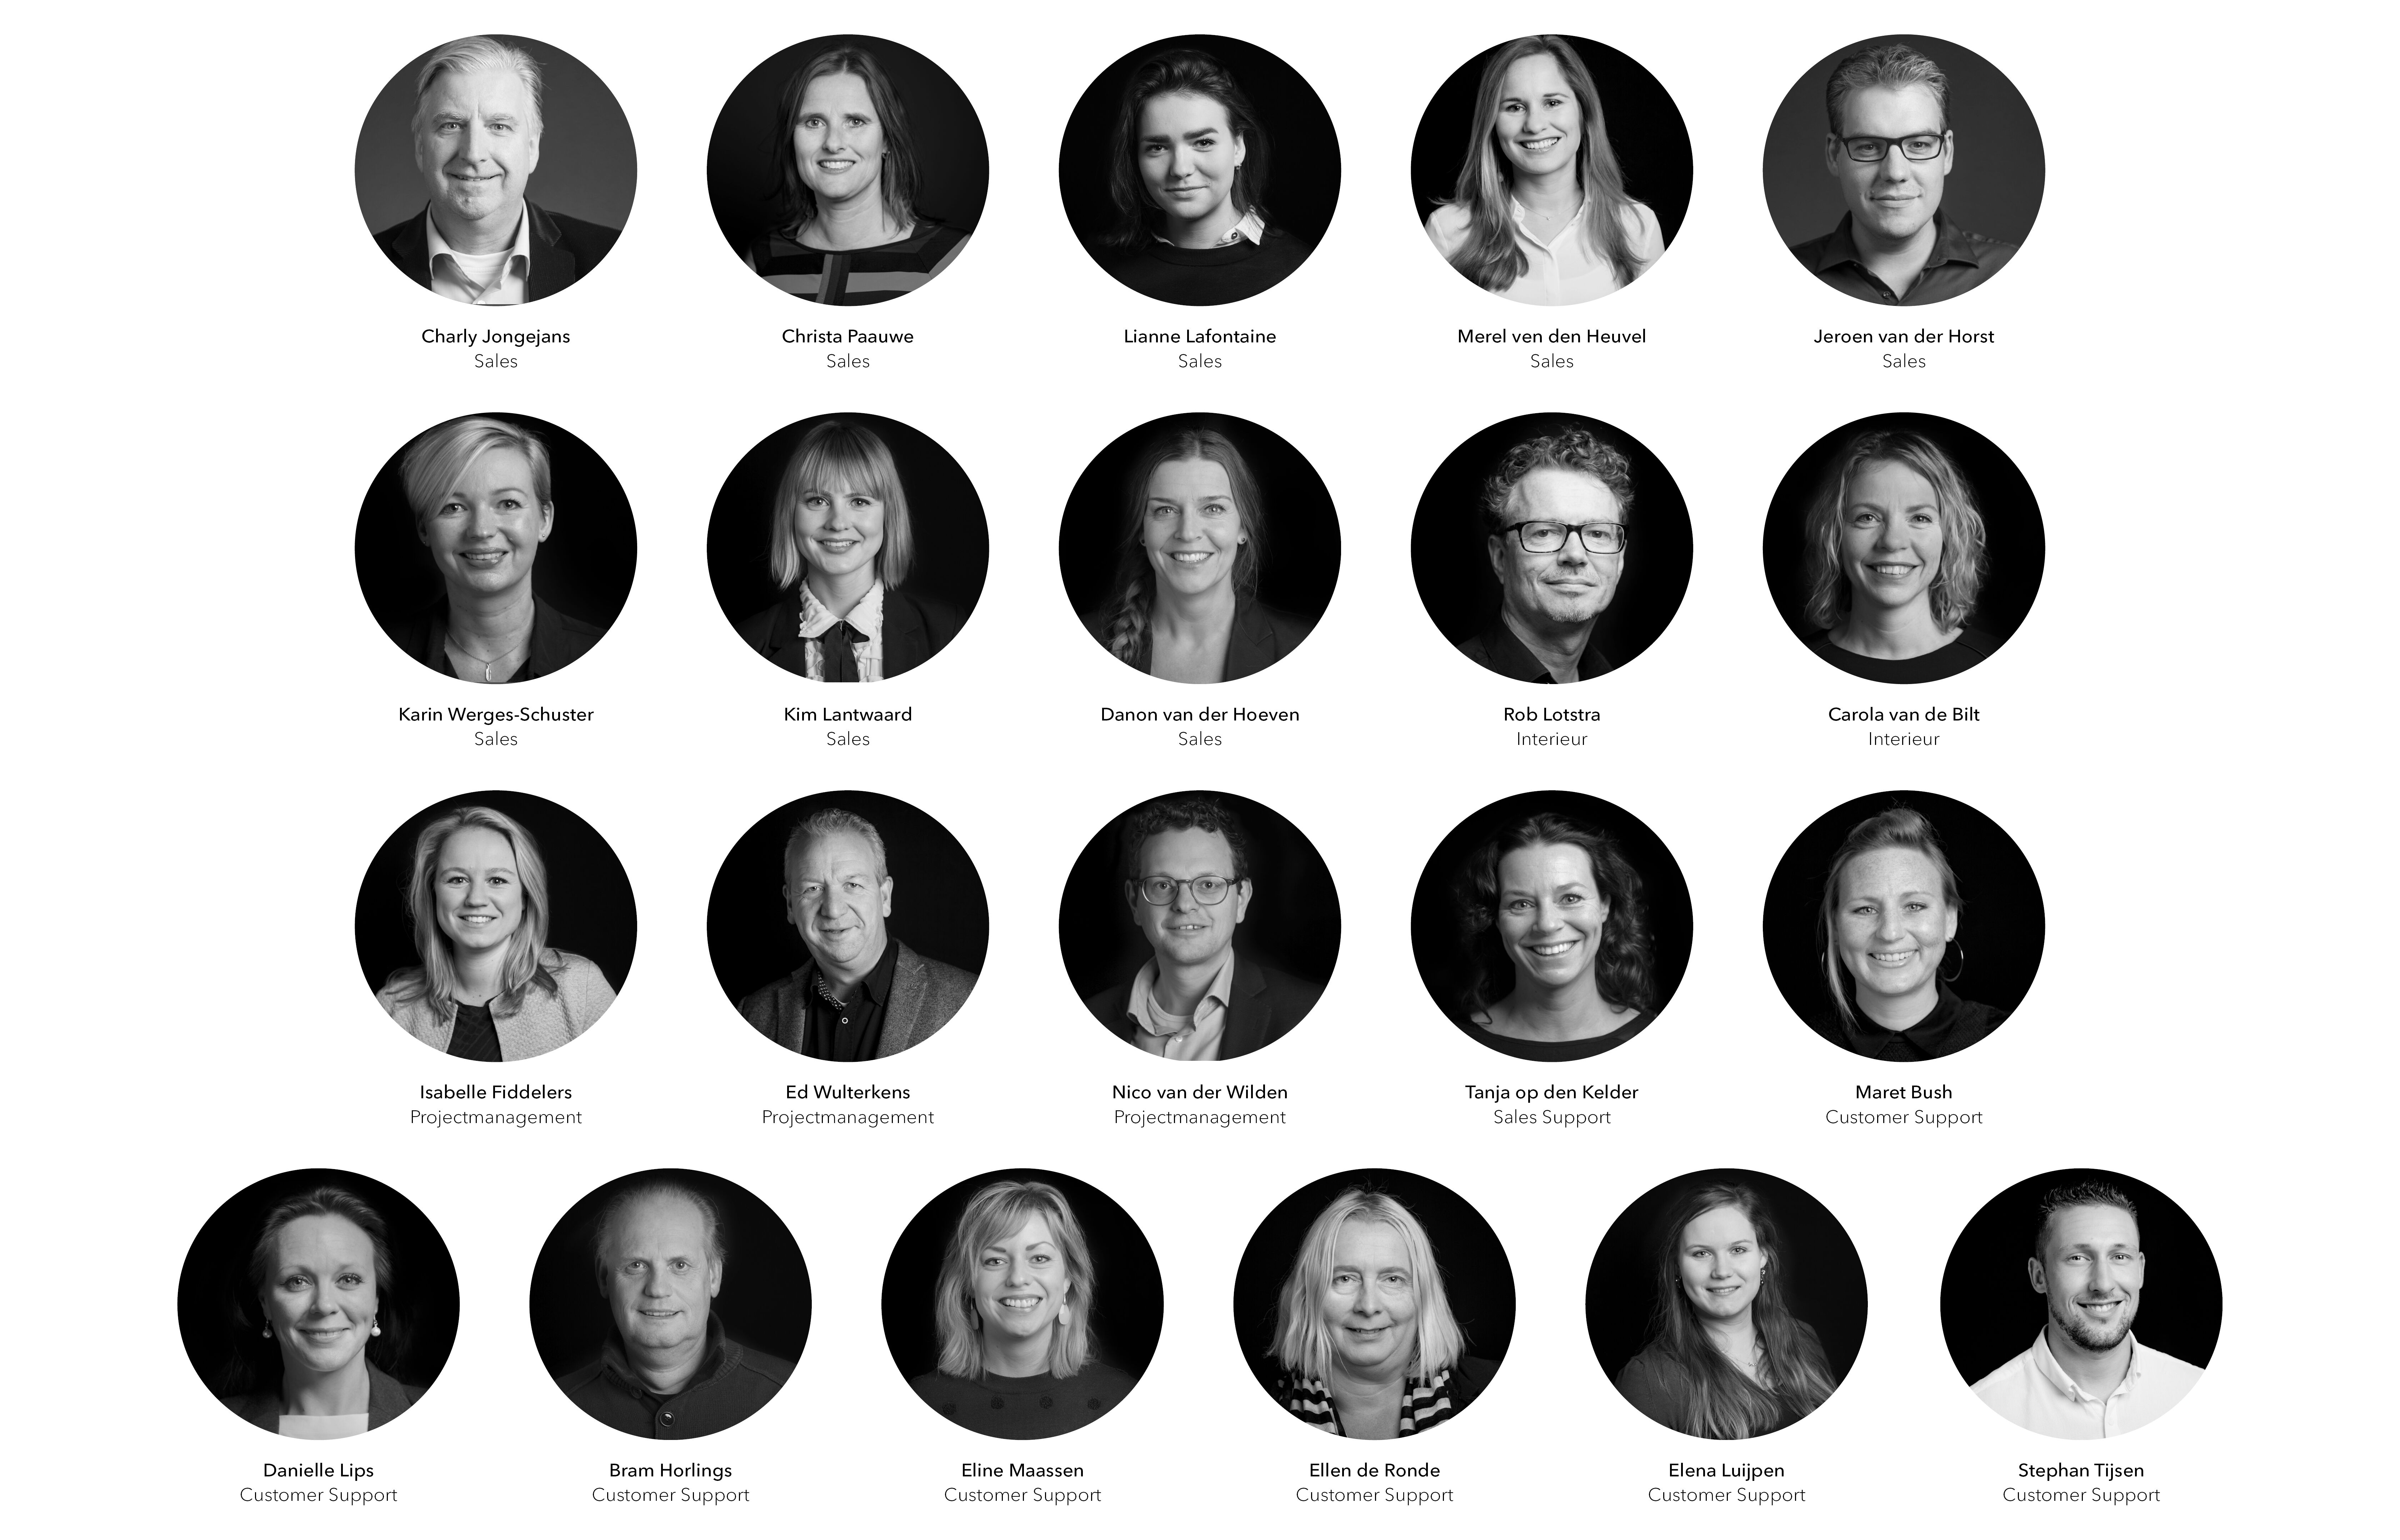 NL Gispen Kantoor thema zwart wit portretten van kantoorteam